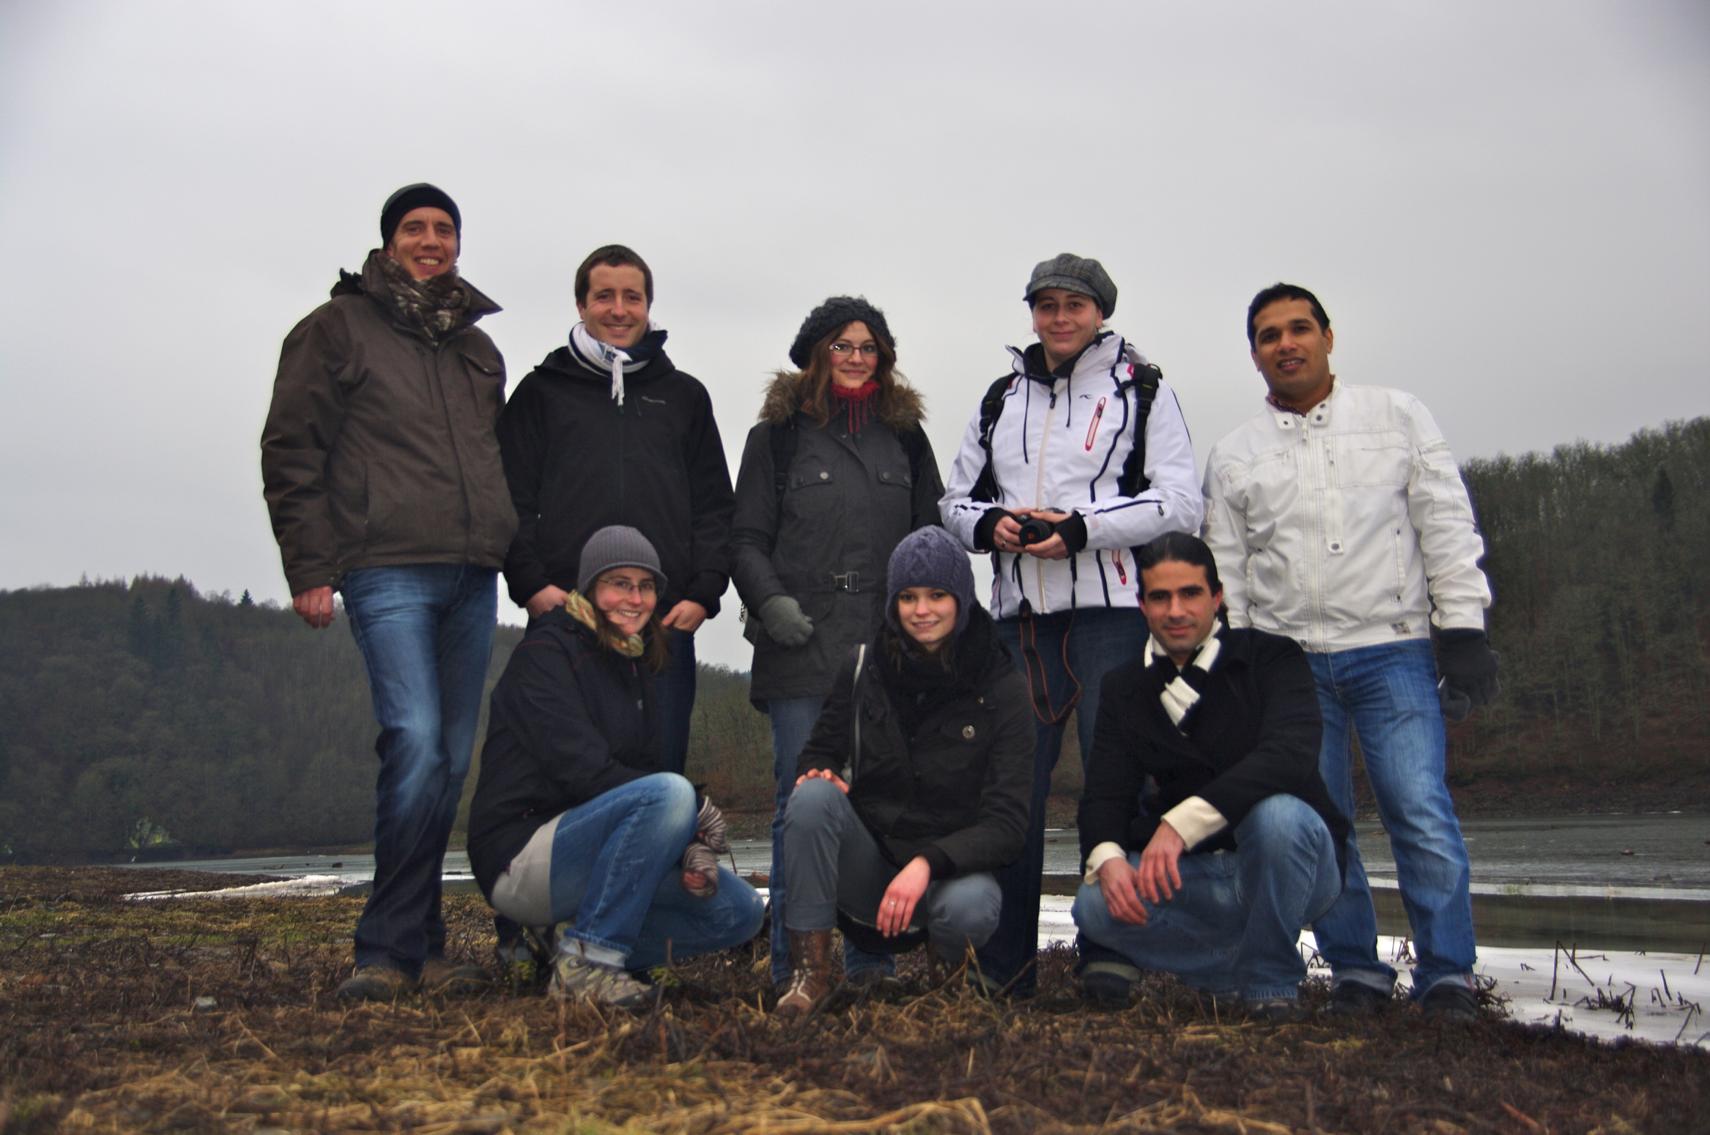 2012 - Back row from left to right: Paul Wilmes, Hugo Roume, Linda Wampach, Jill Bohler, Pranjul ShahFront row from left to right: Emilie Muller, Laura Lebrun, Nicolas Pinel